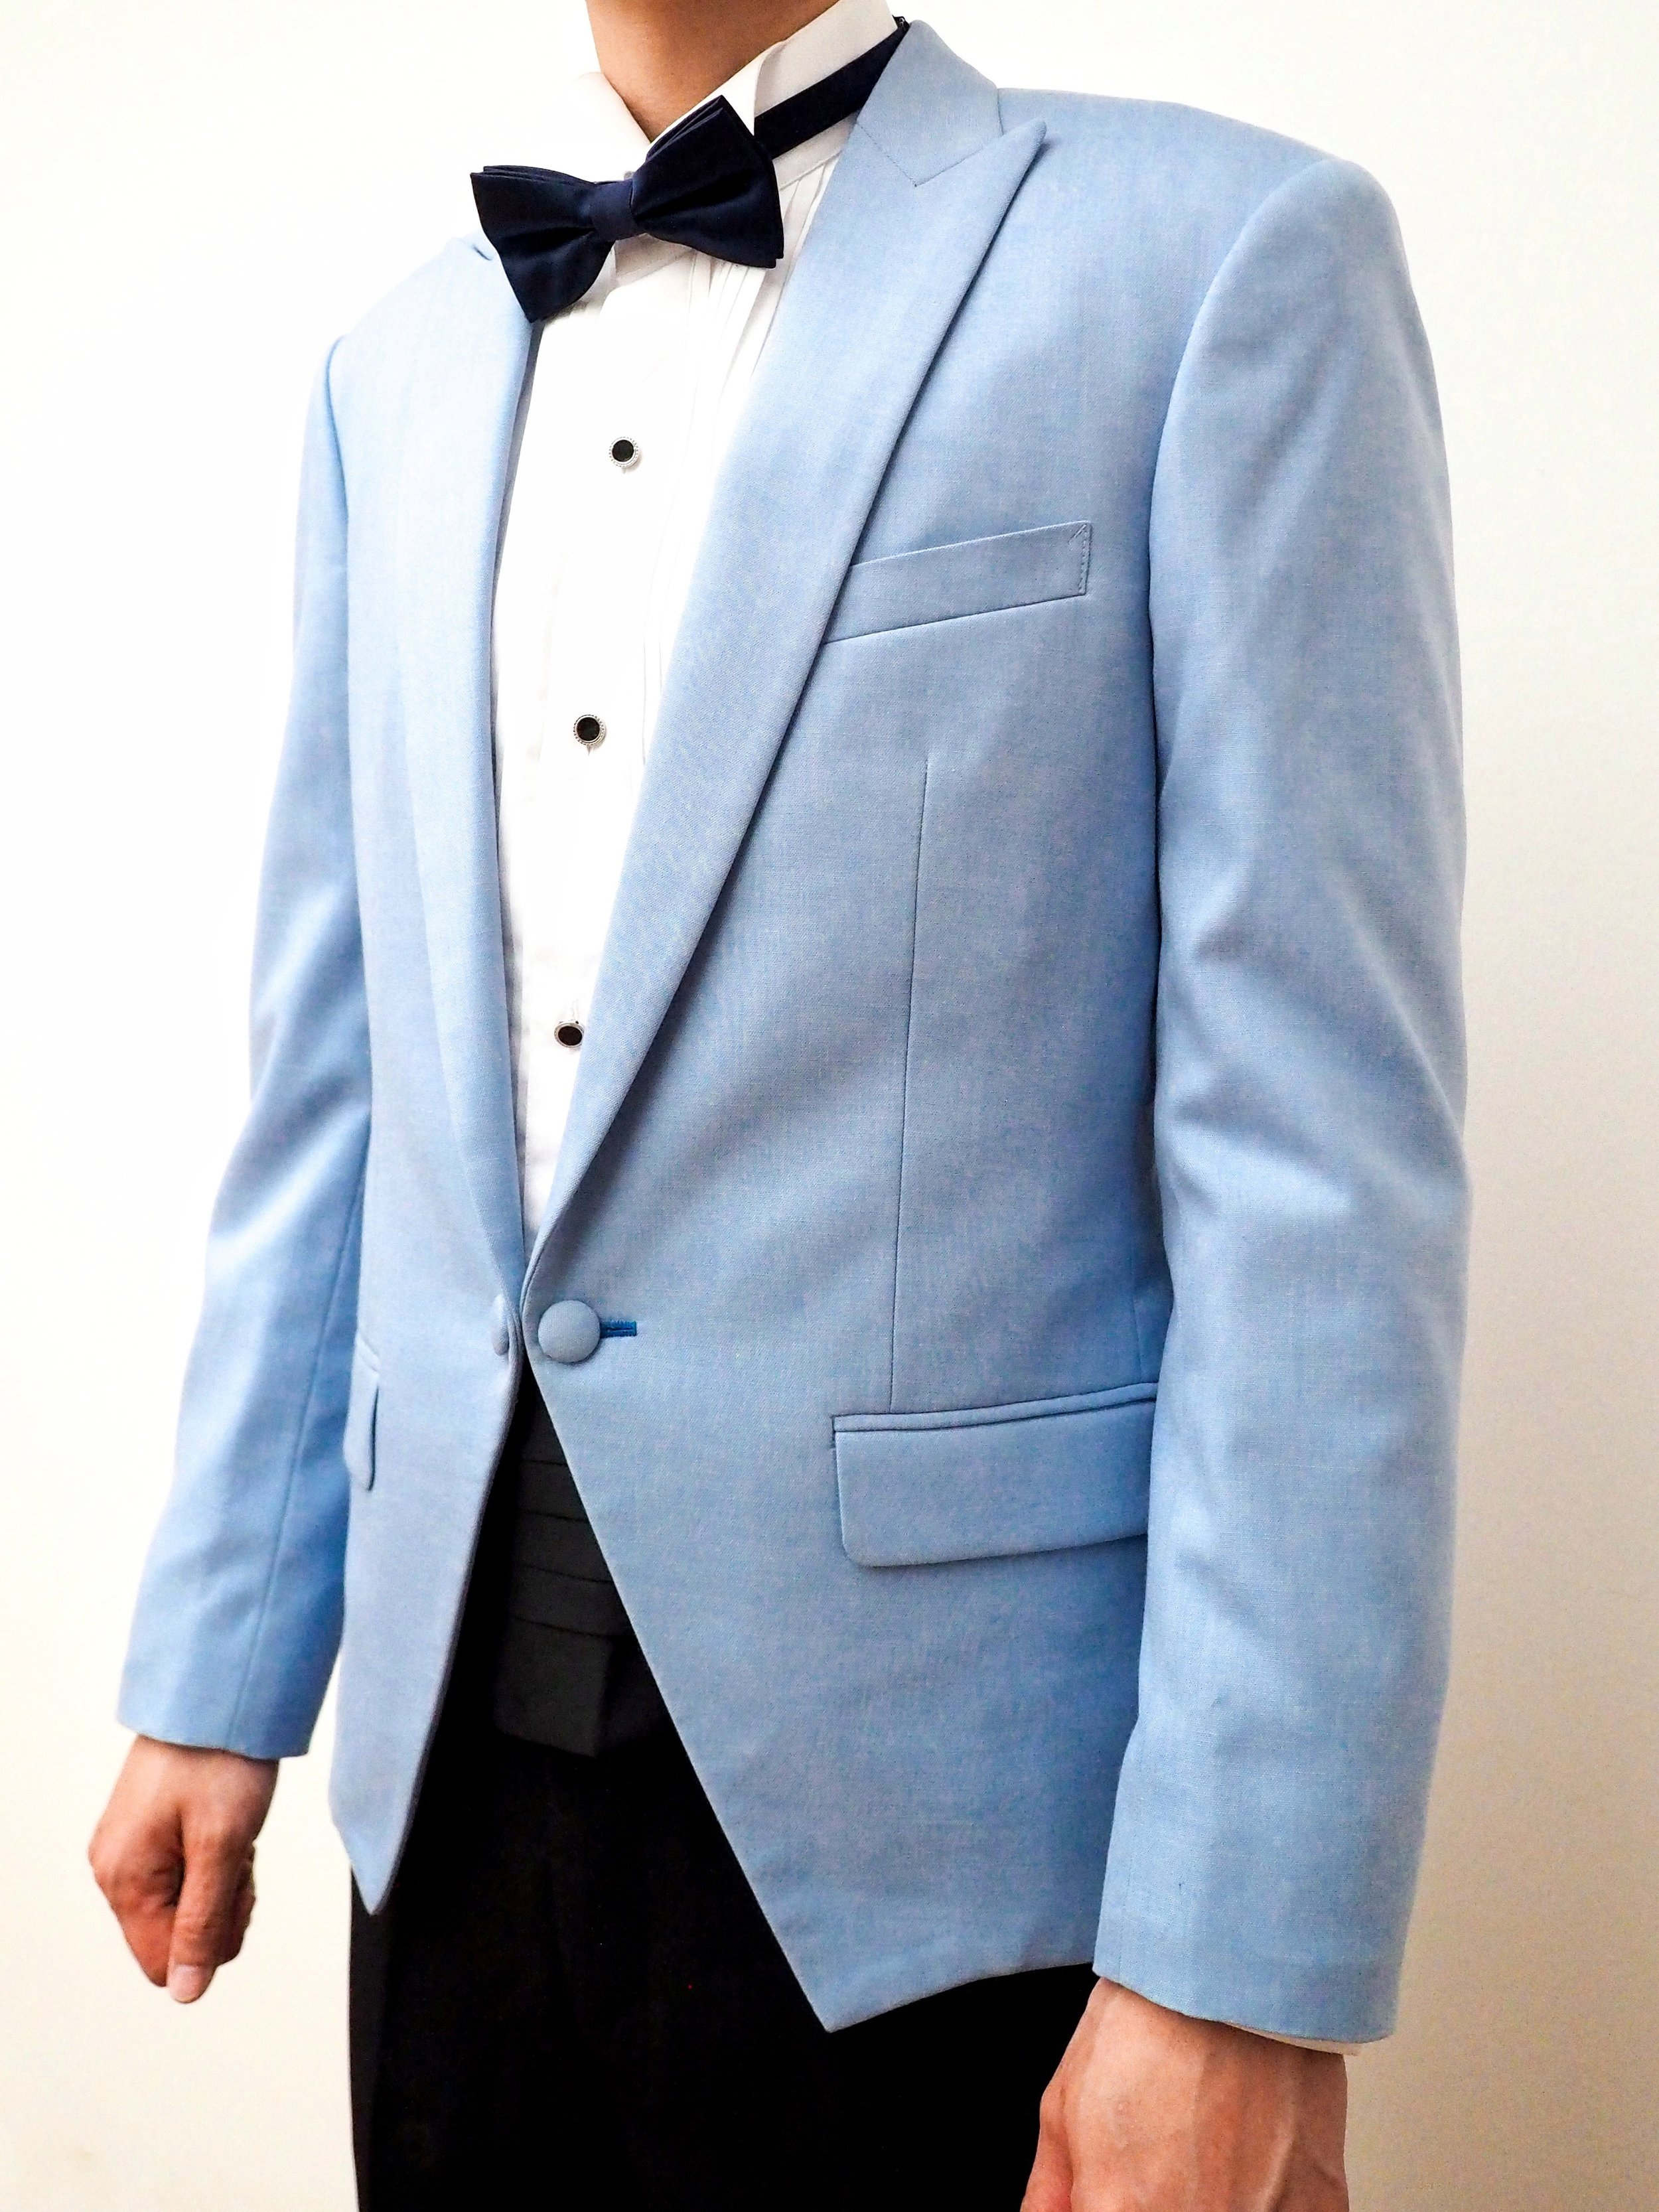 Light blue wedding suit by CCM Wedding